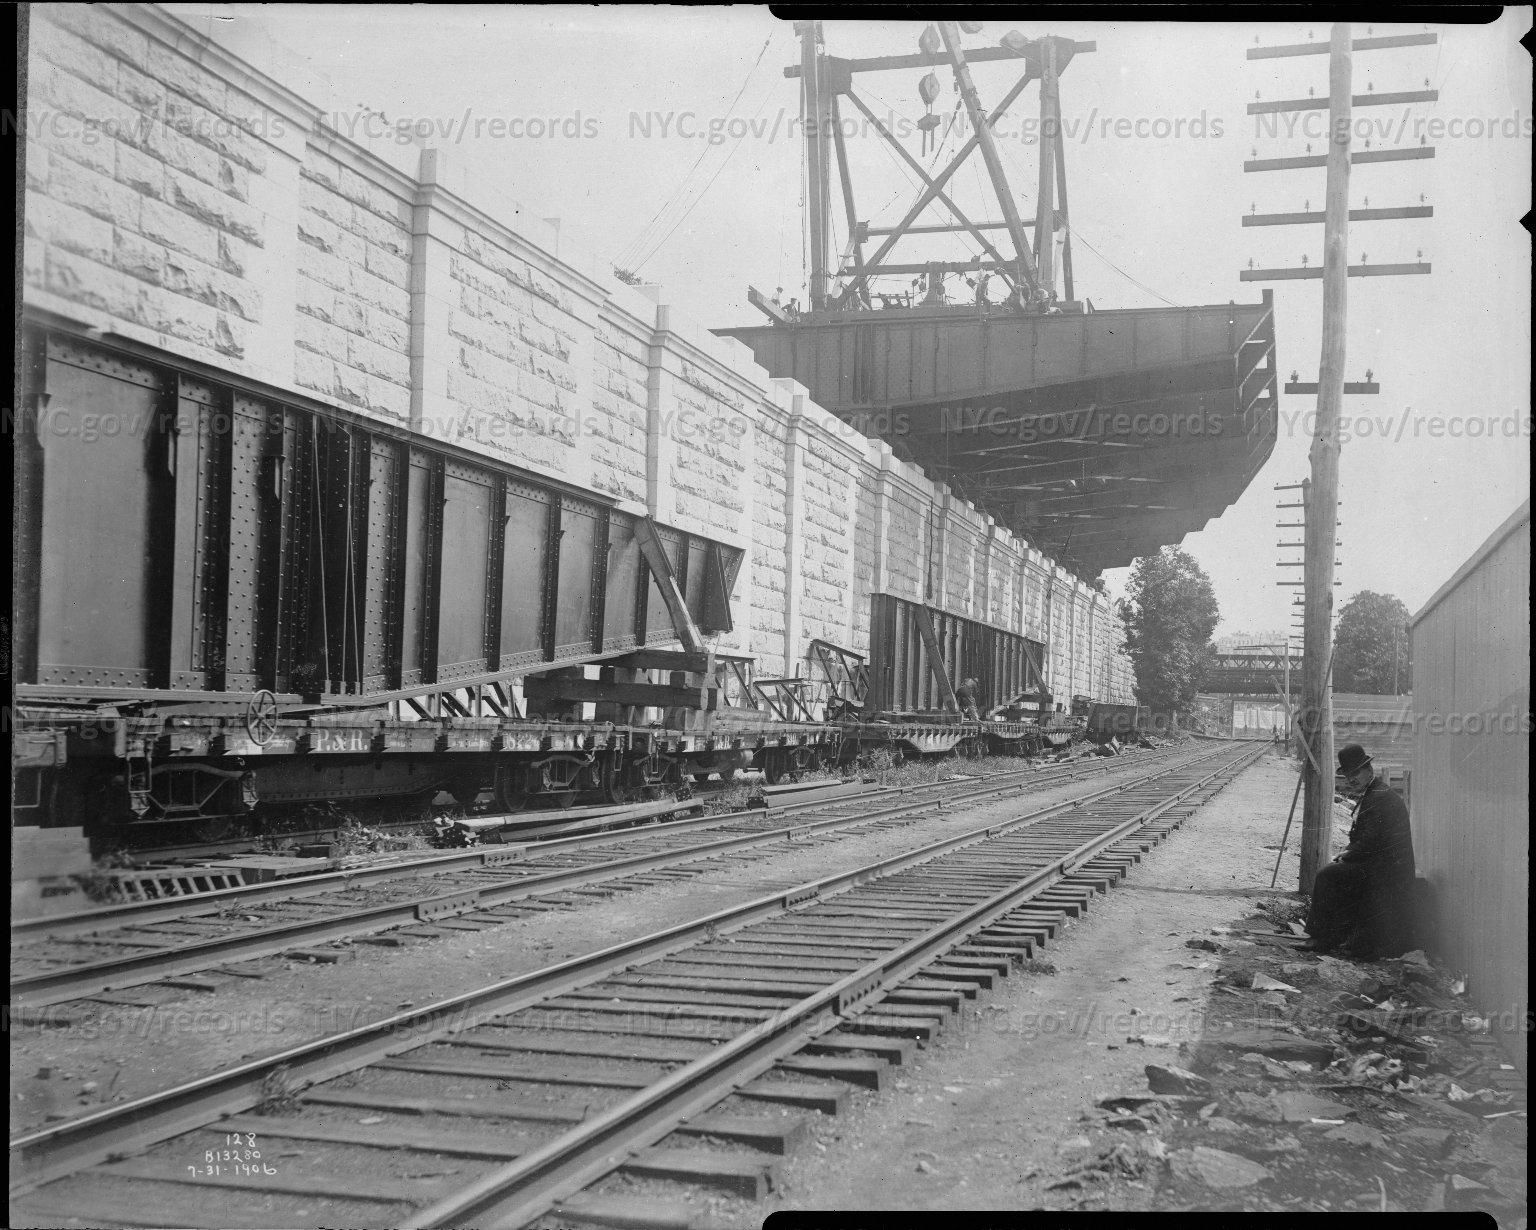 Wall, Railroad Tracks, Crain